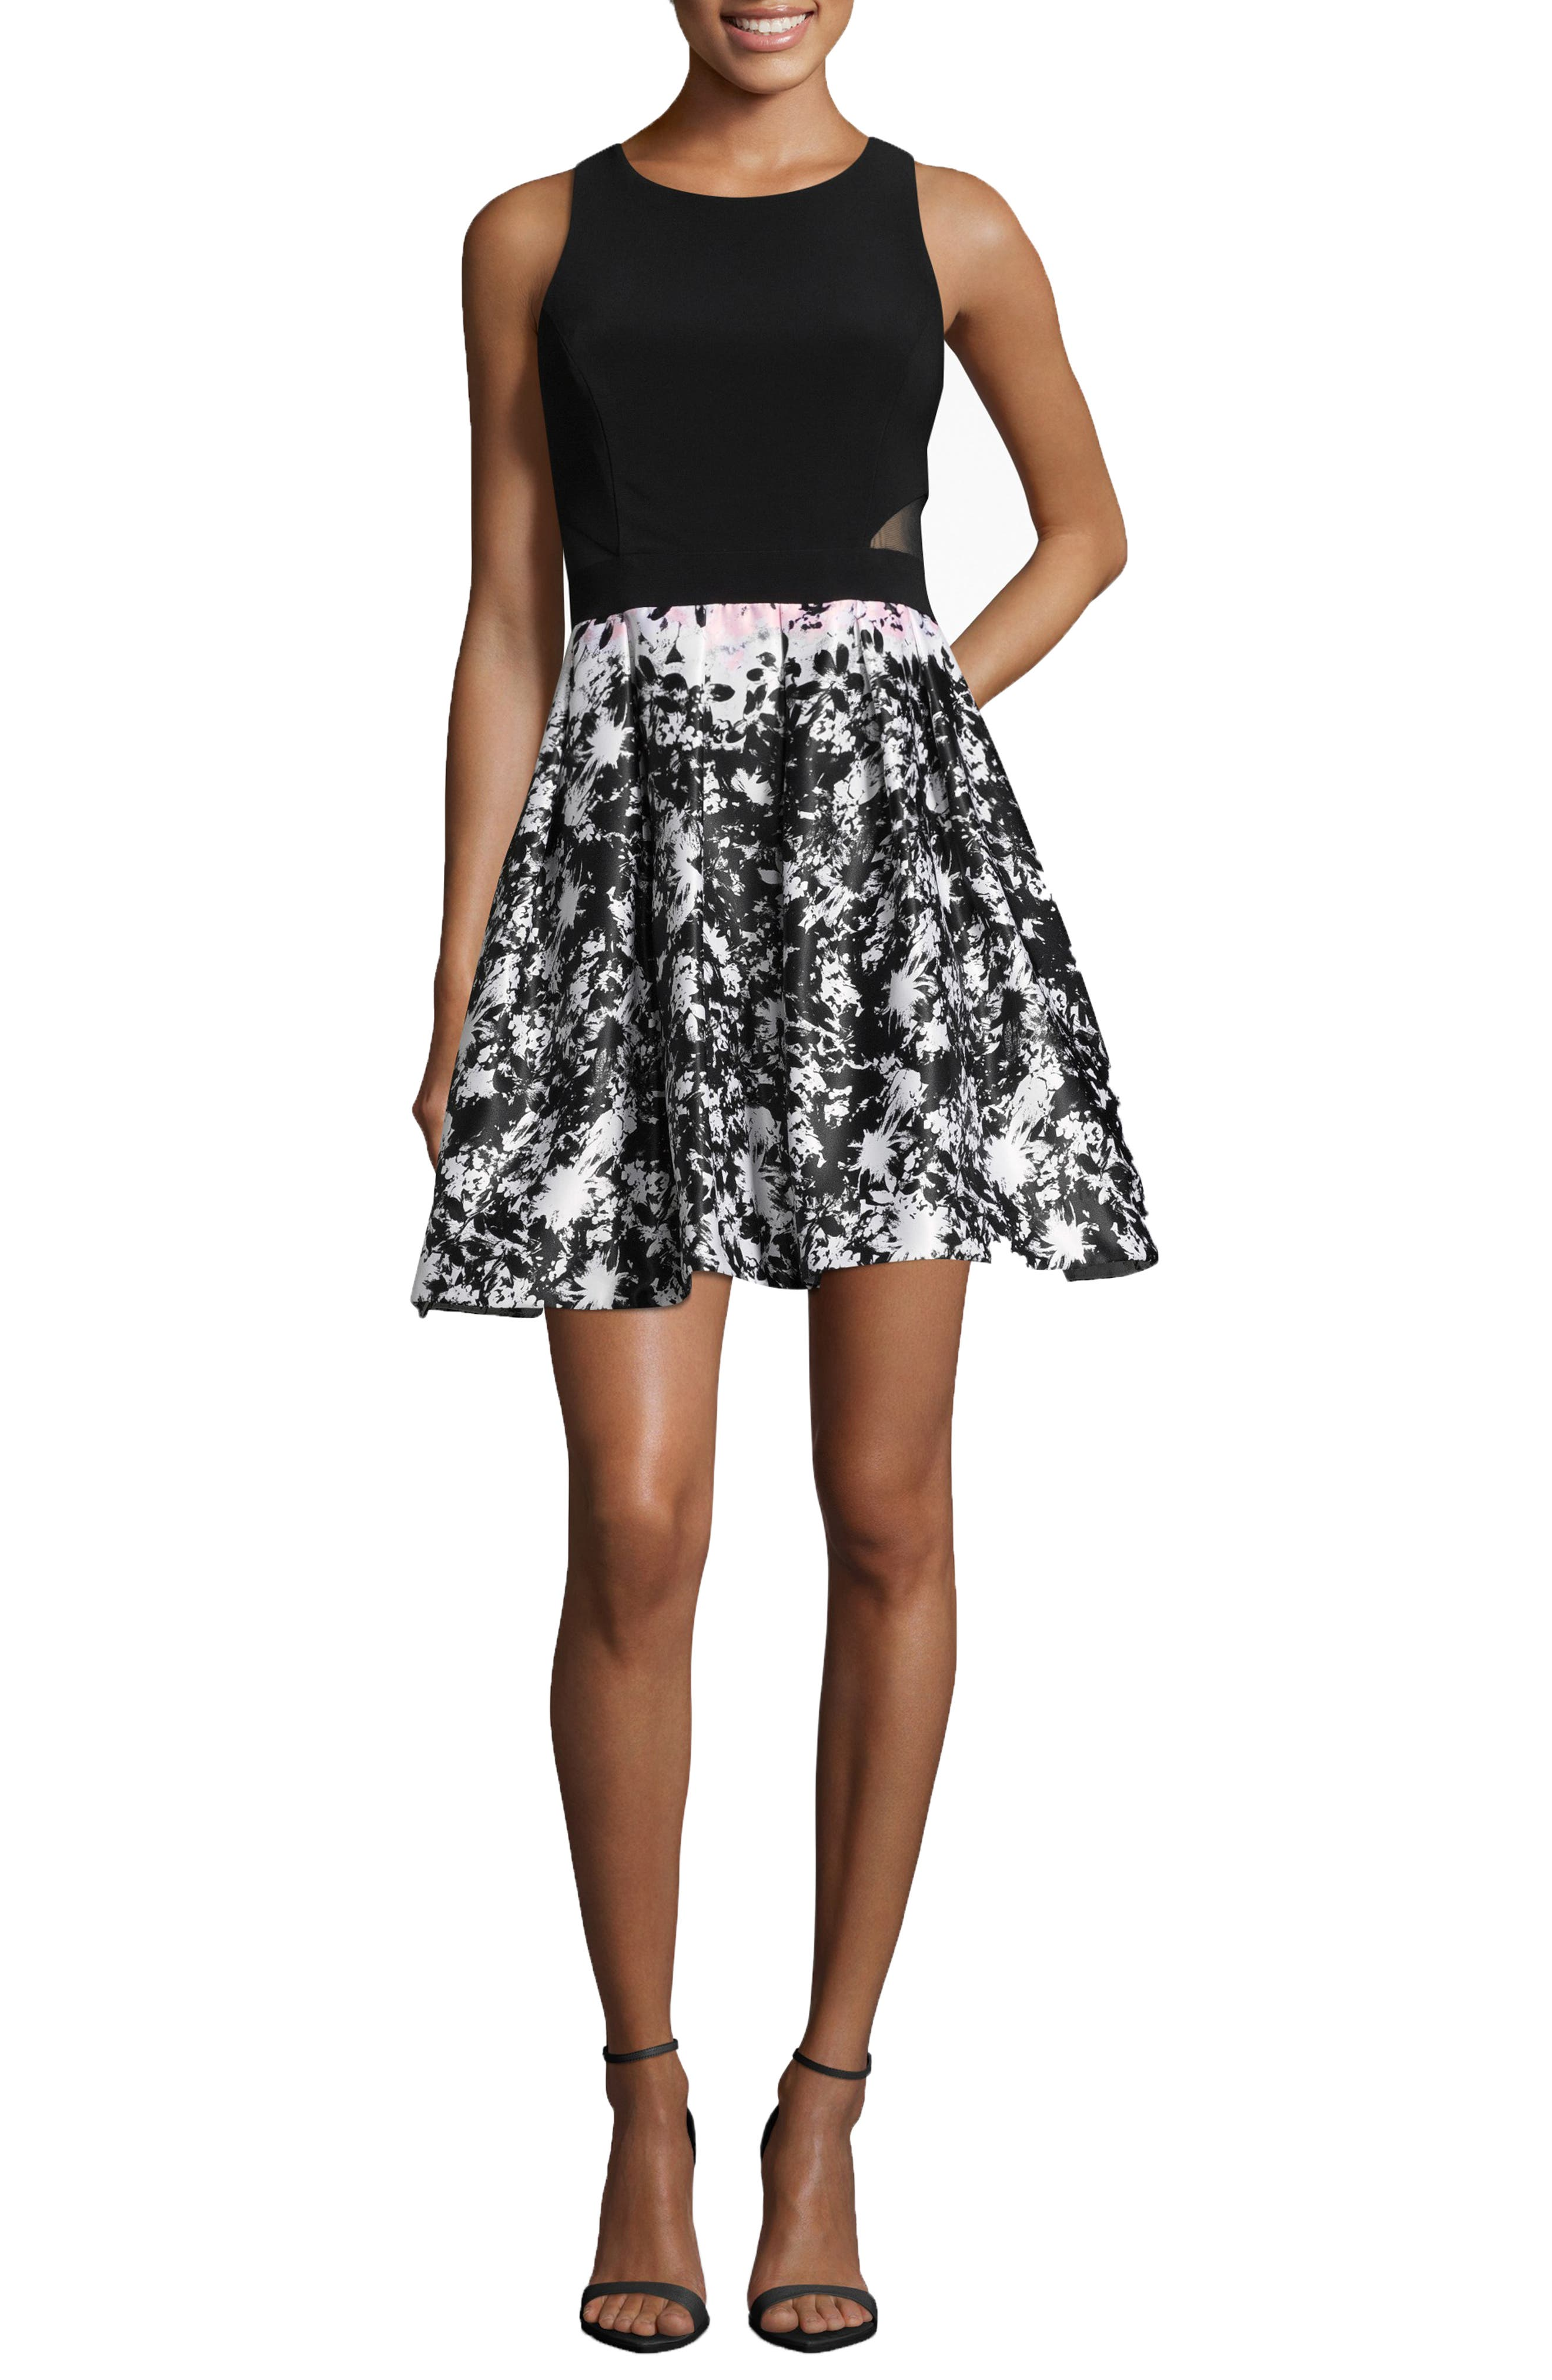 Xscape Print Skirt Party Dress, Black